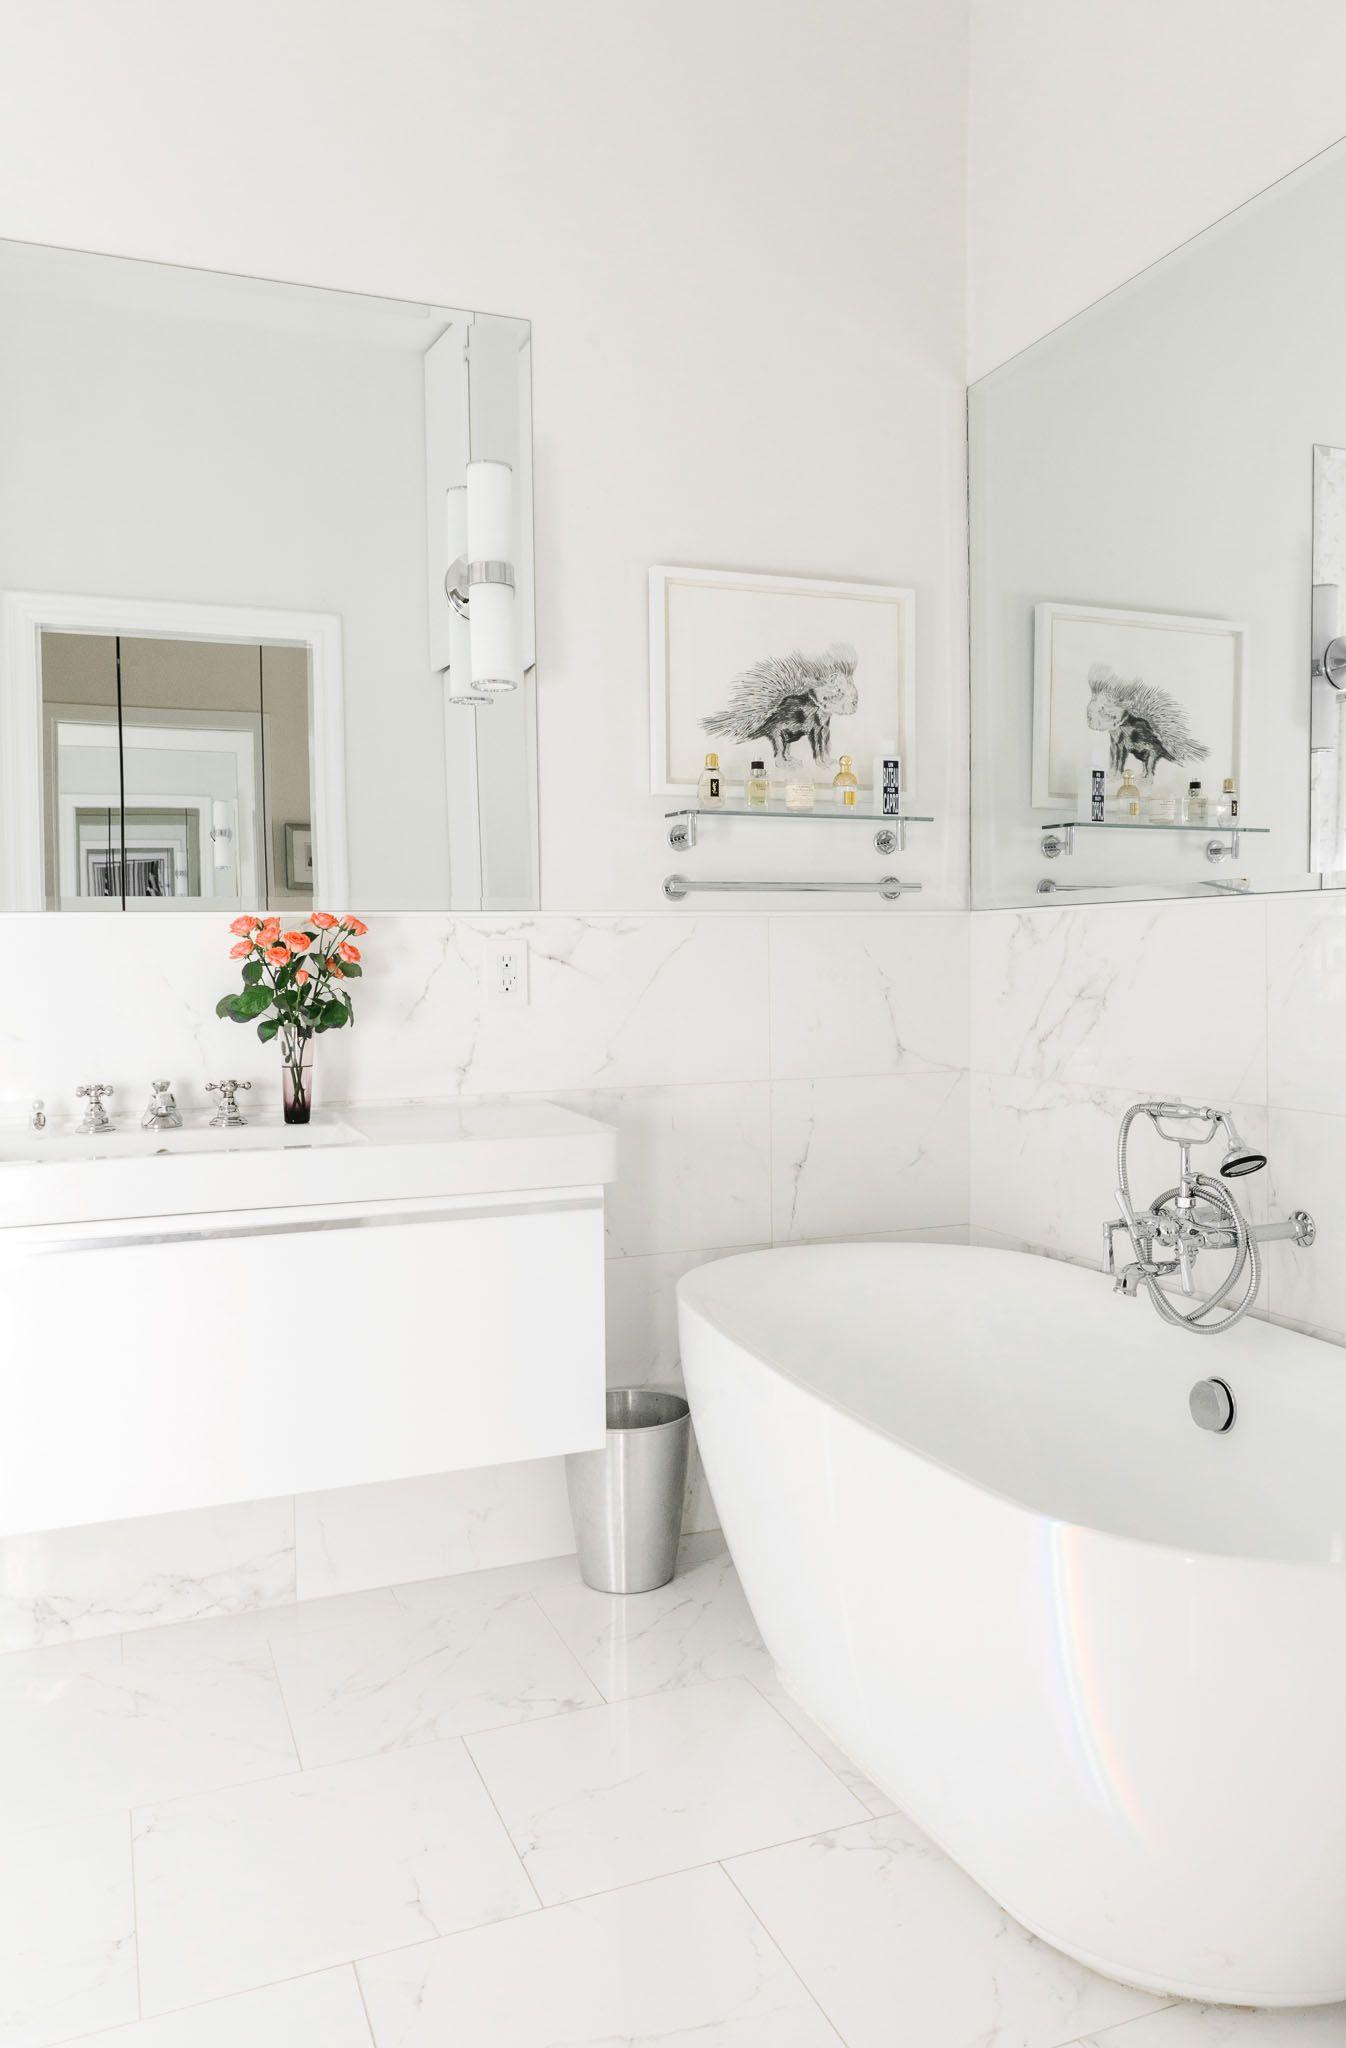 "12 x 12"" (?) marble tiled floor and walls homepolish-annouchka-020316-16"